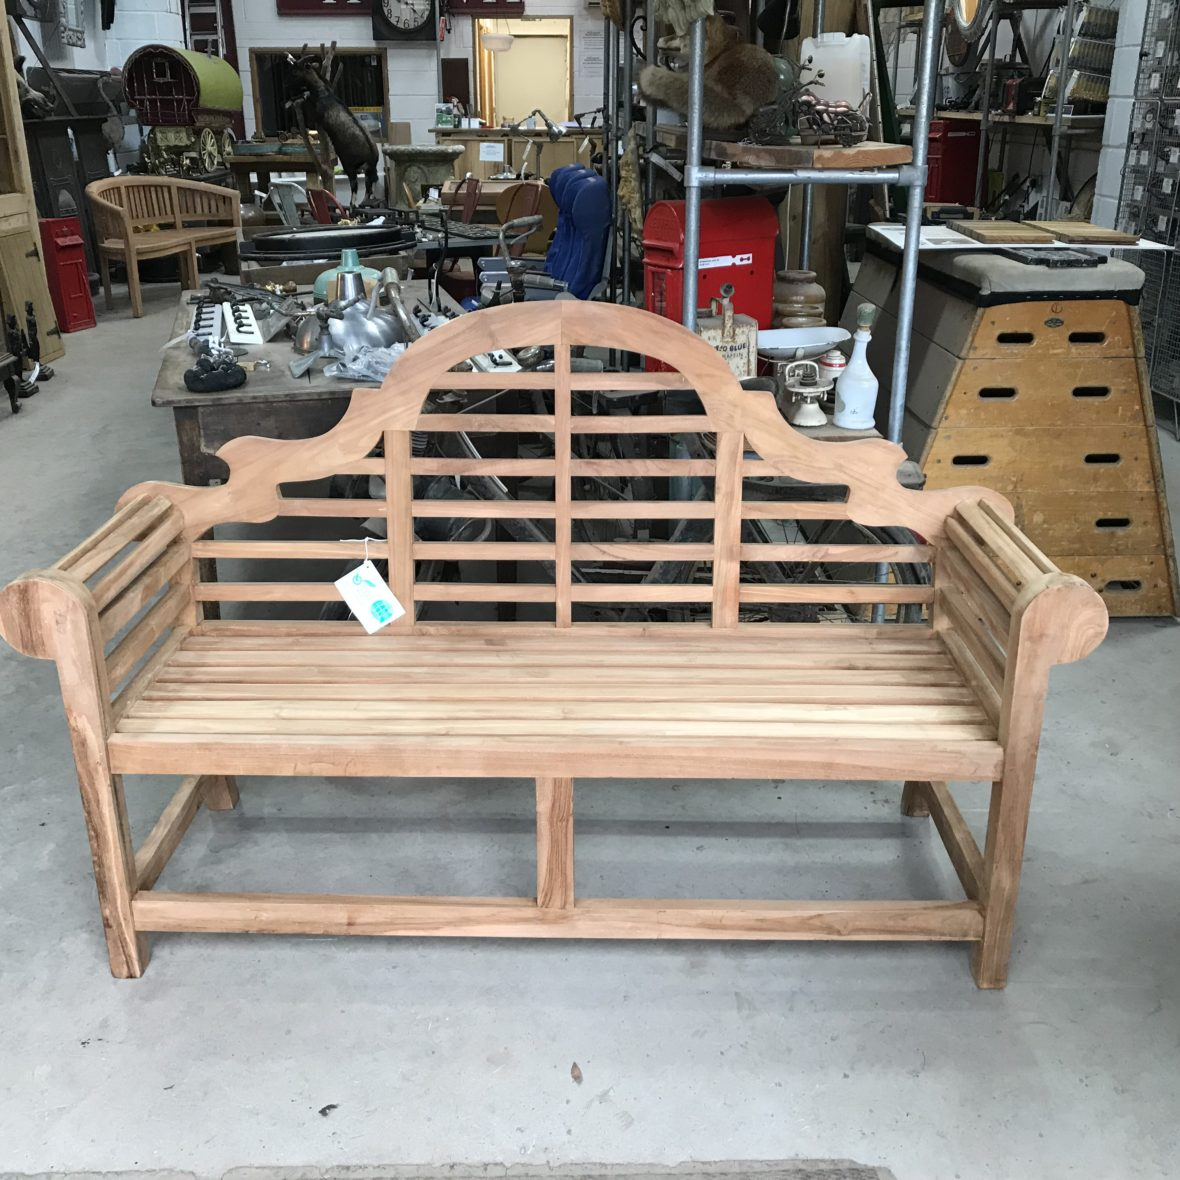 Lutyens Teak Garden Bench - The Beechfield Reclamation Co